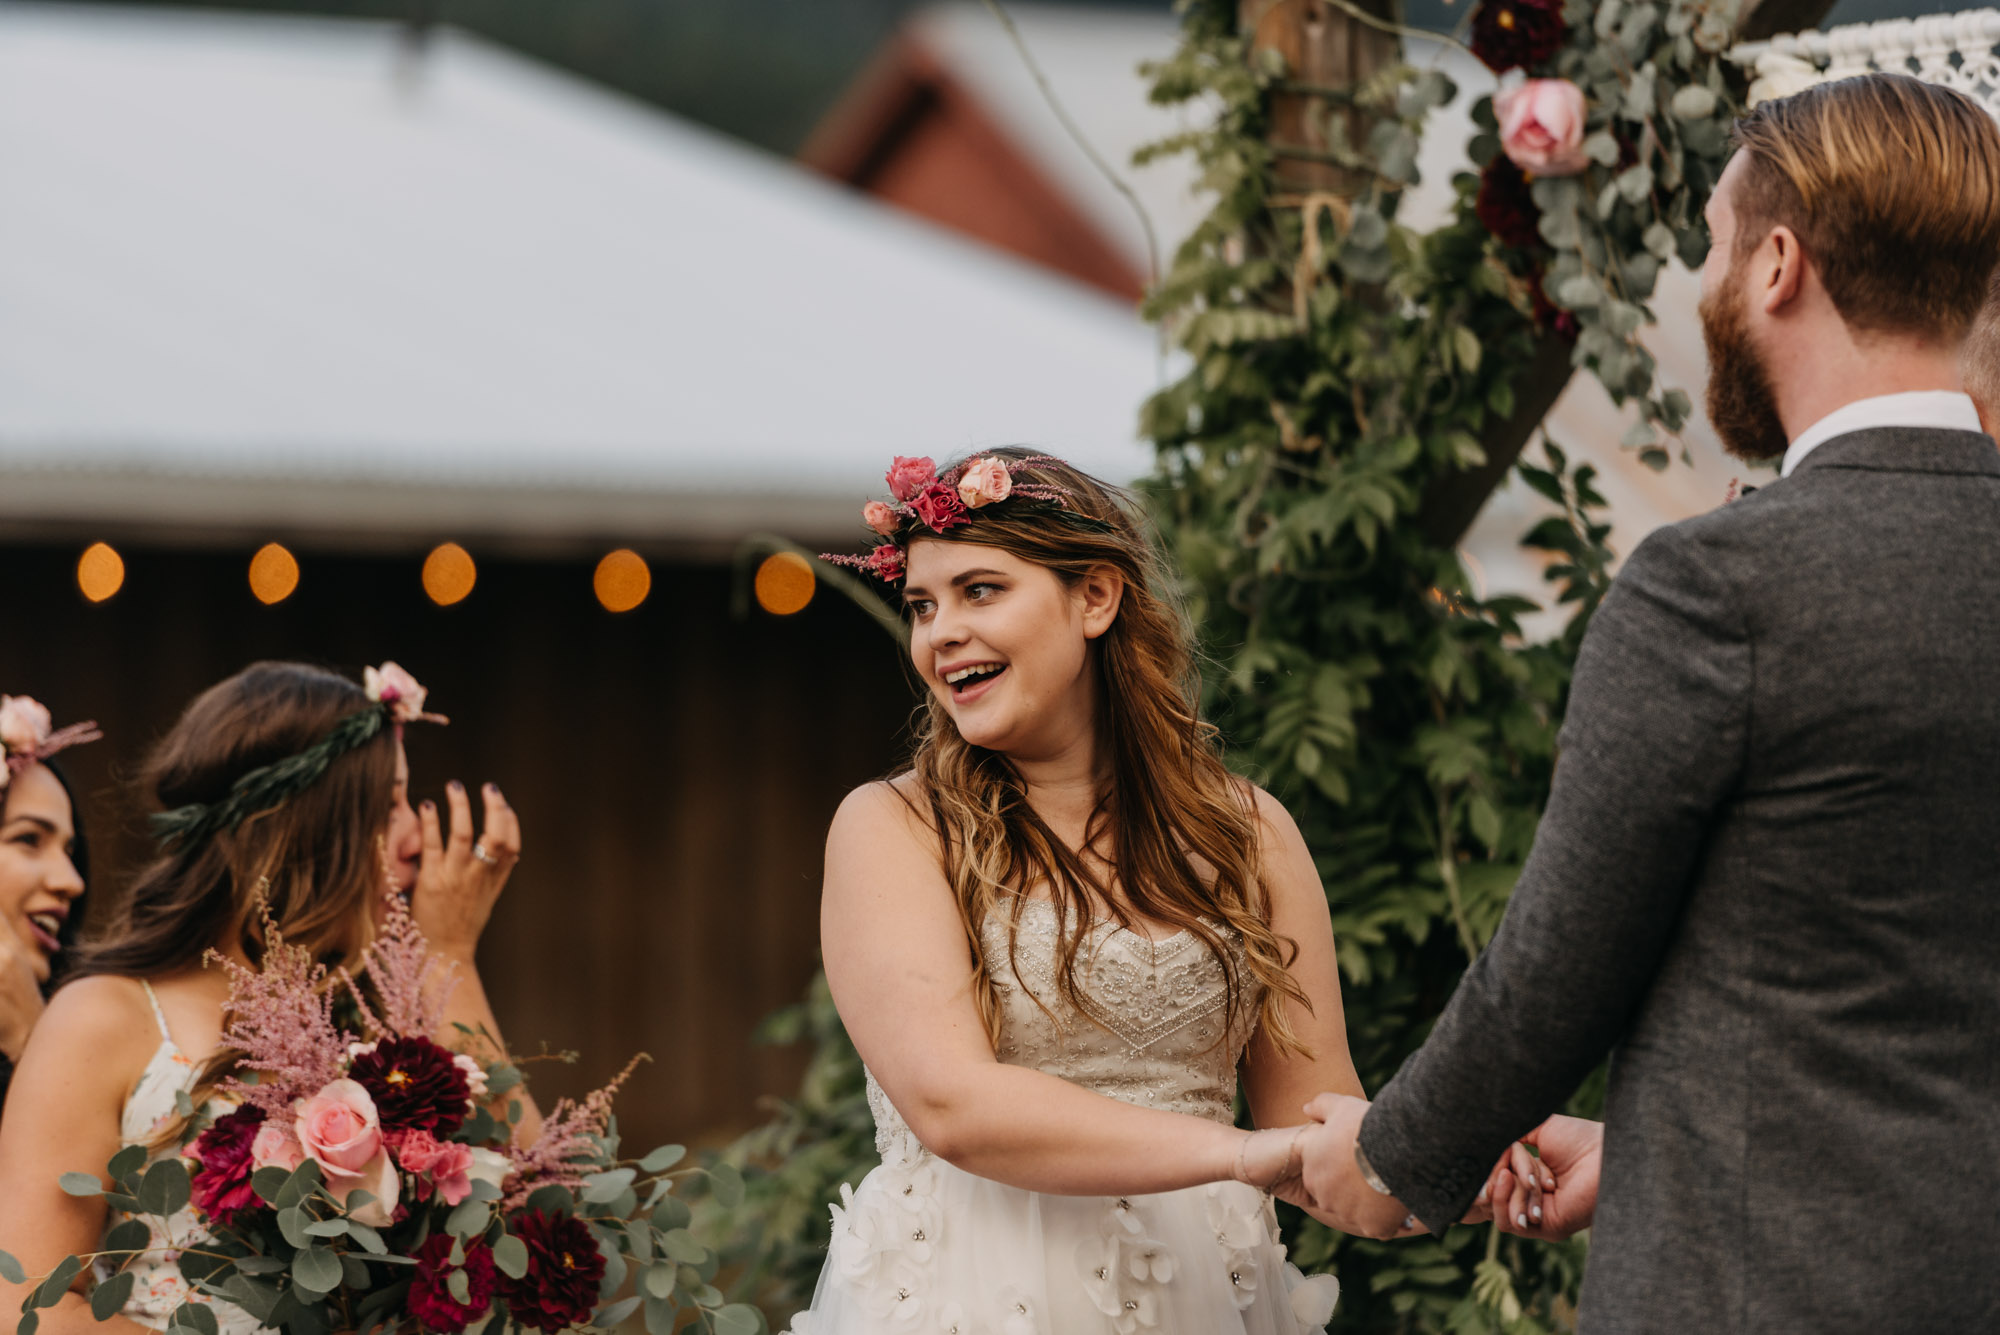 Outdoor-Summer-Ceremony-Washington-Wedding-Rainbow-9098.jpg